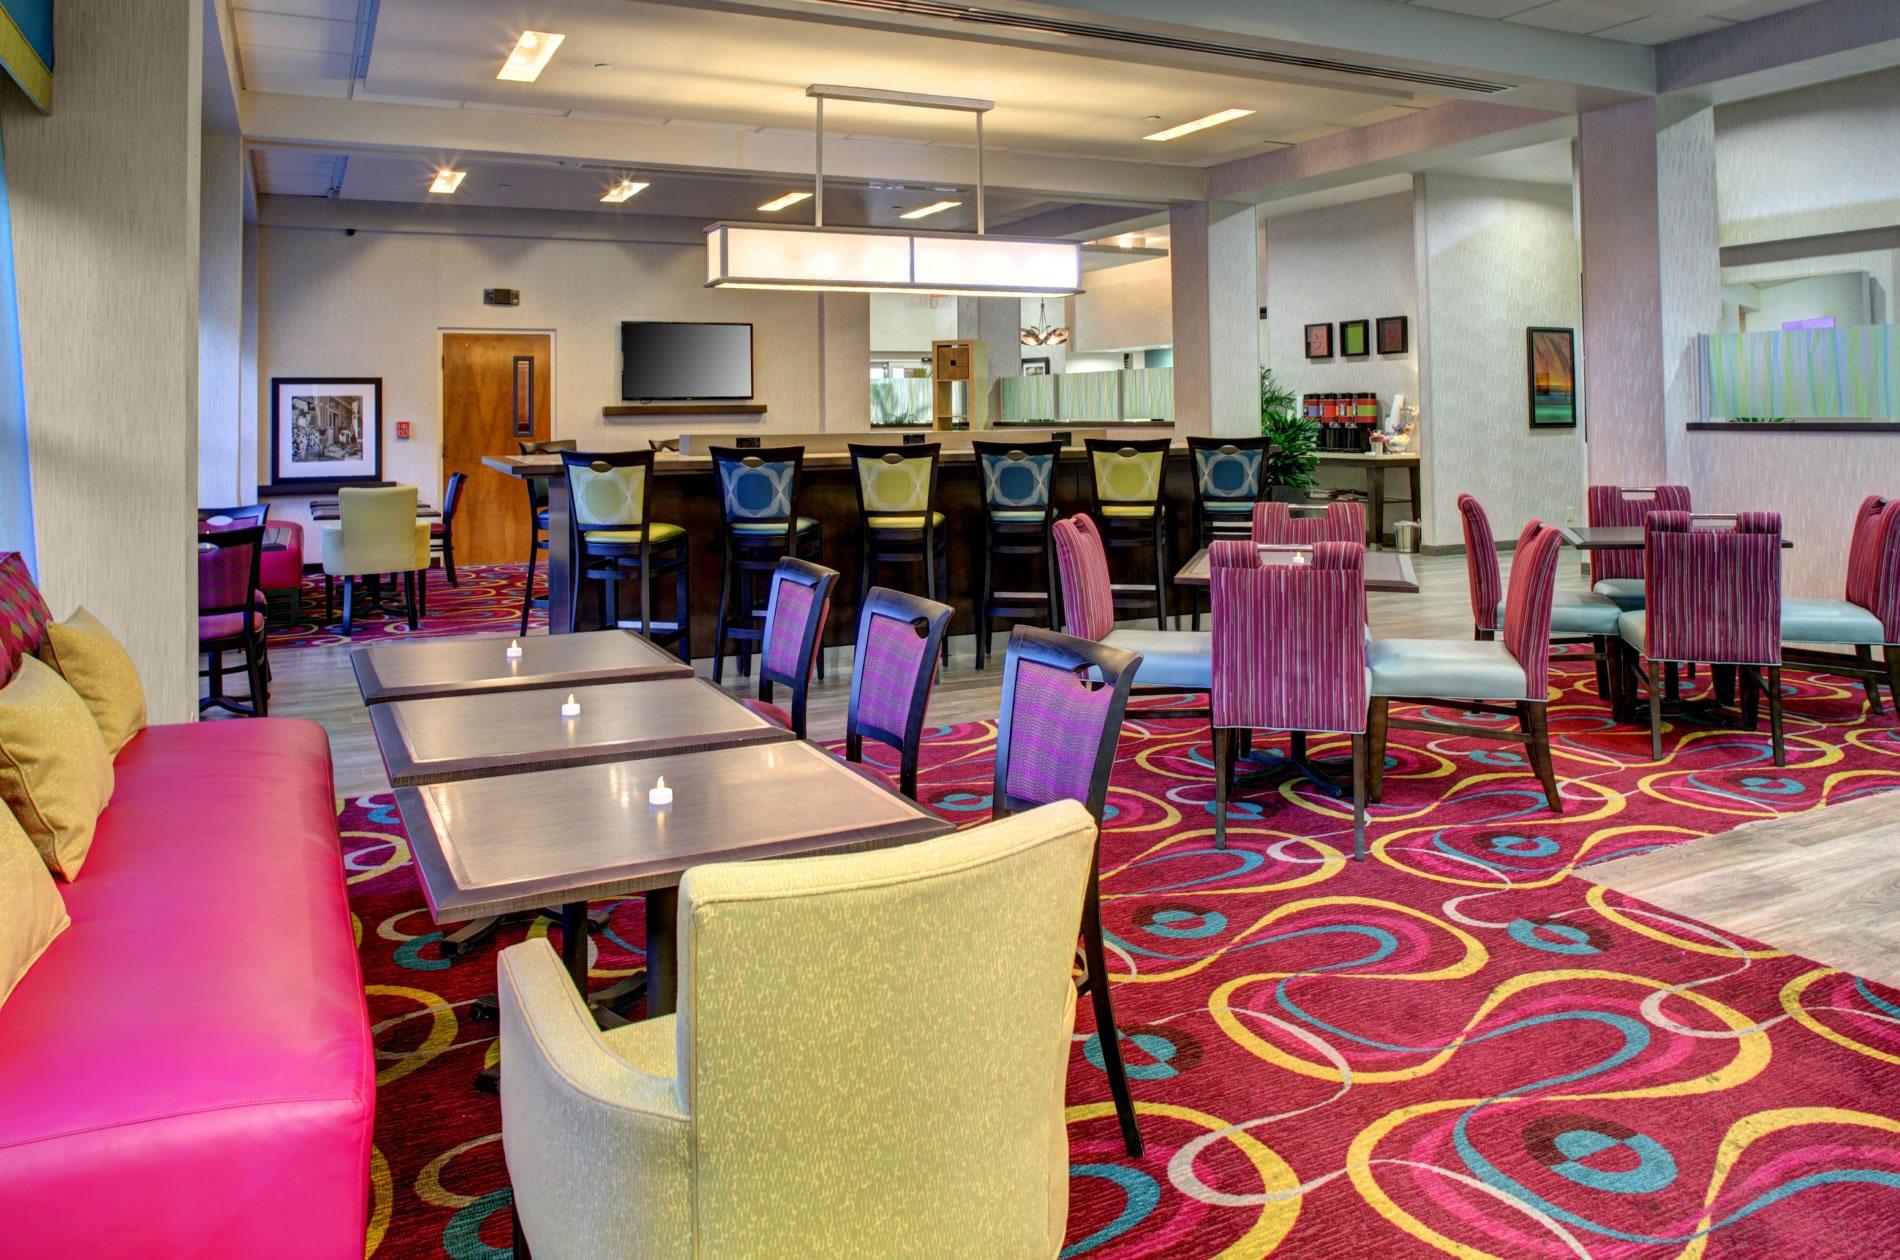 Hampton Inn by Hilton Coconut Grove Coral Gables Miami image 3